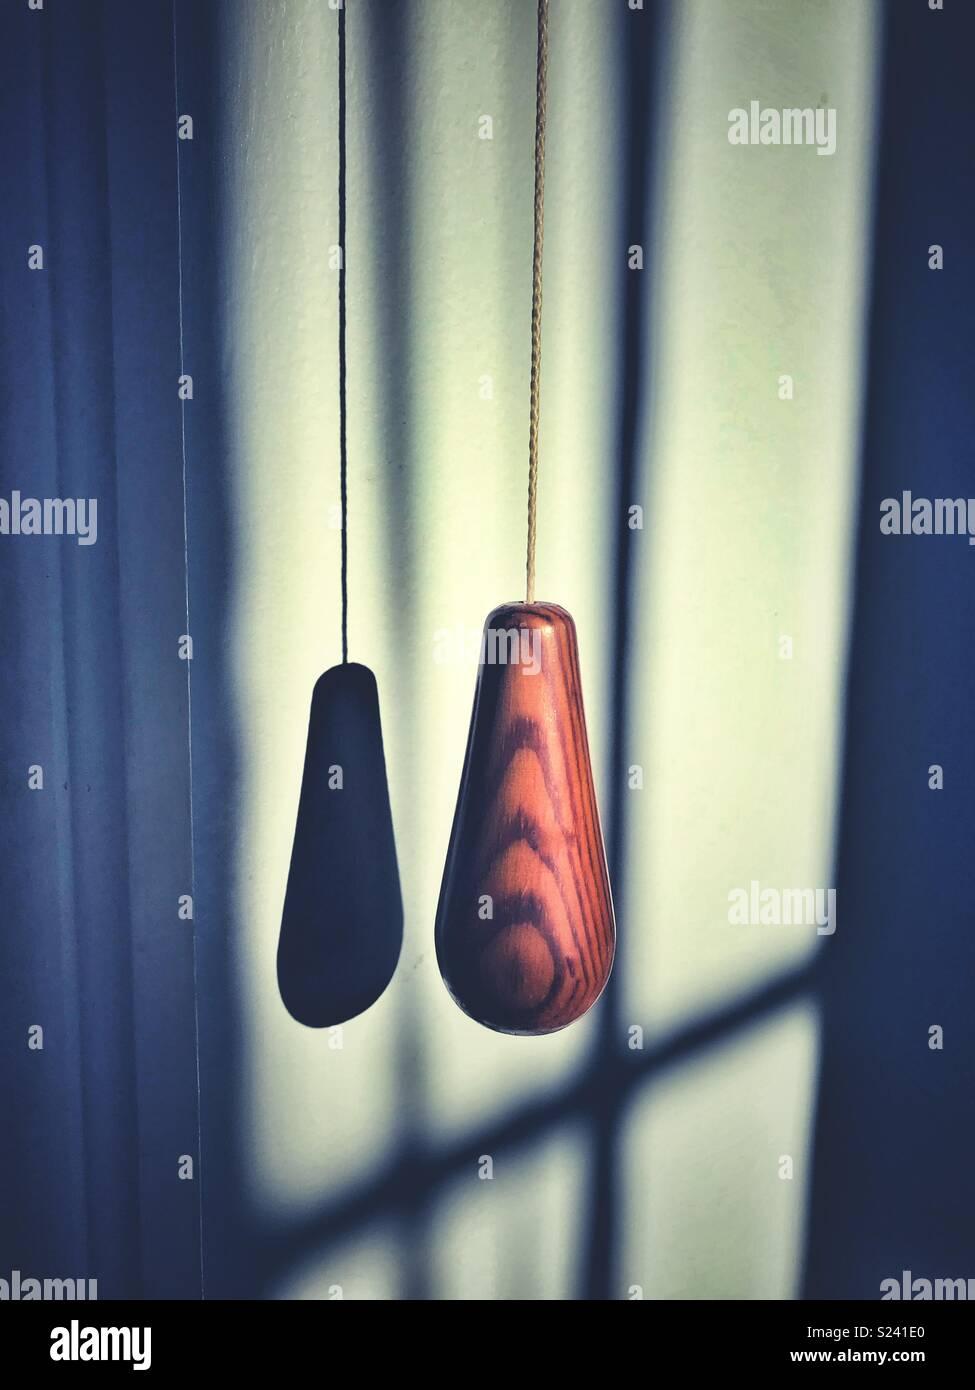 A wooden lighting handle - Stock Image